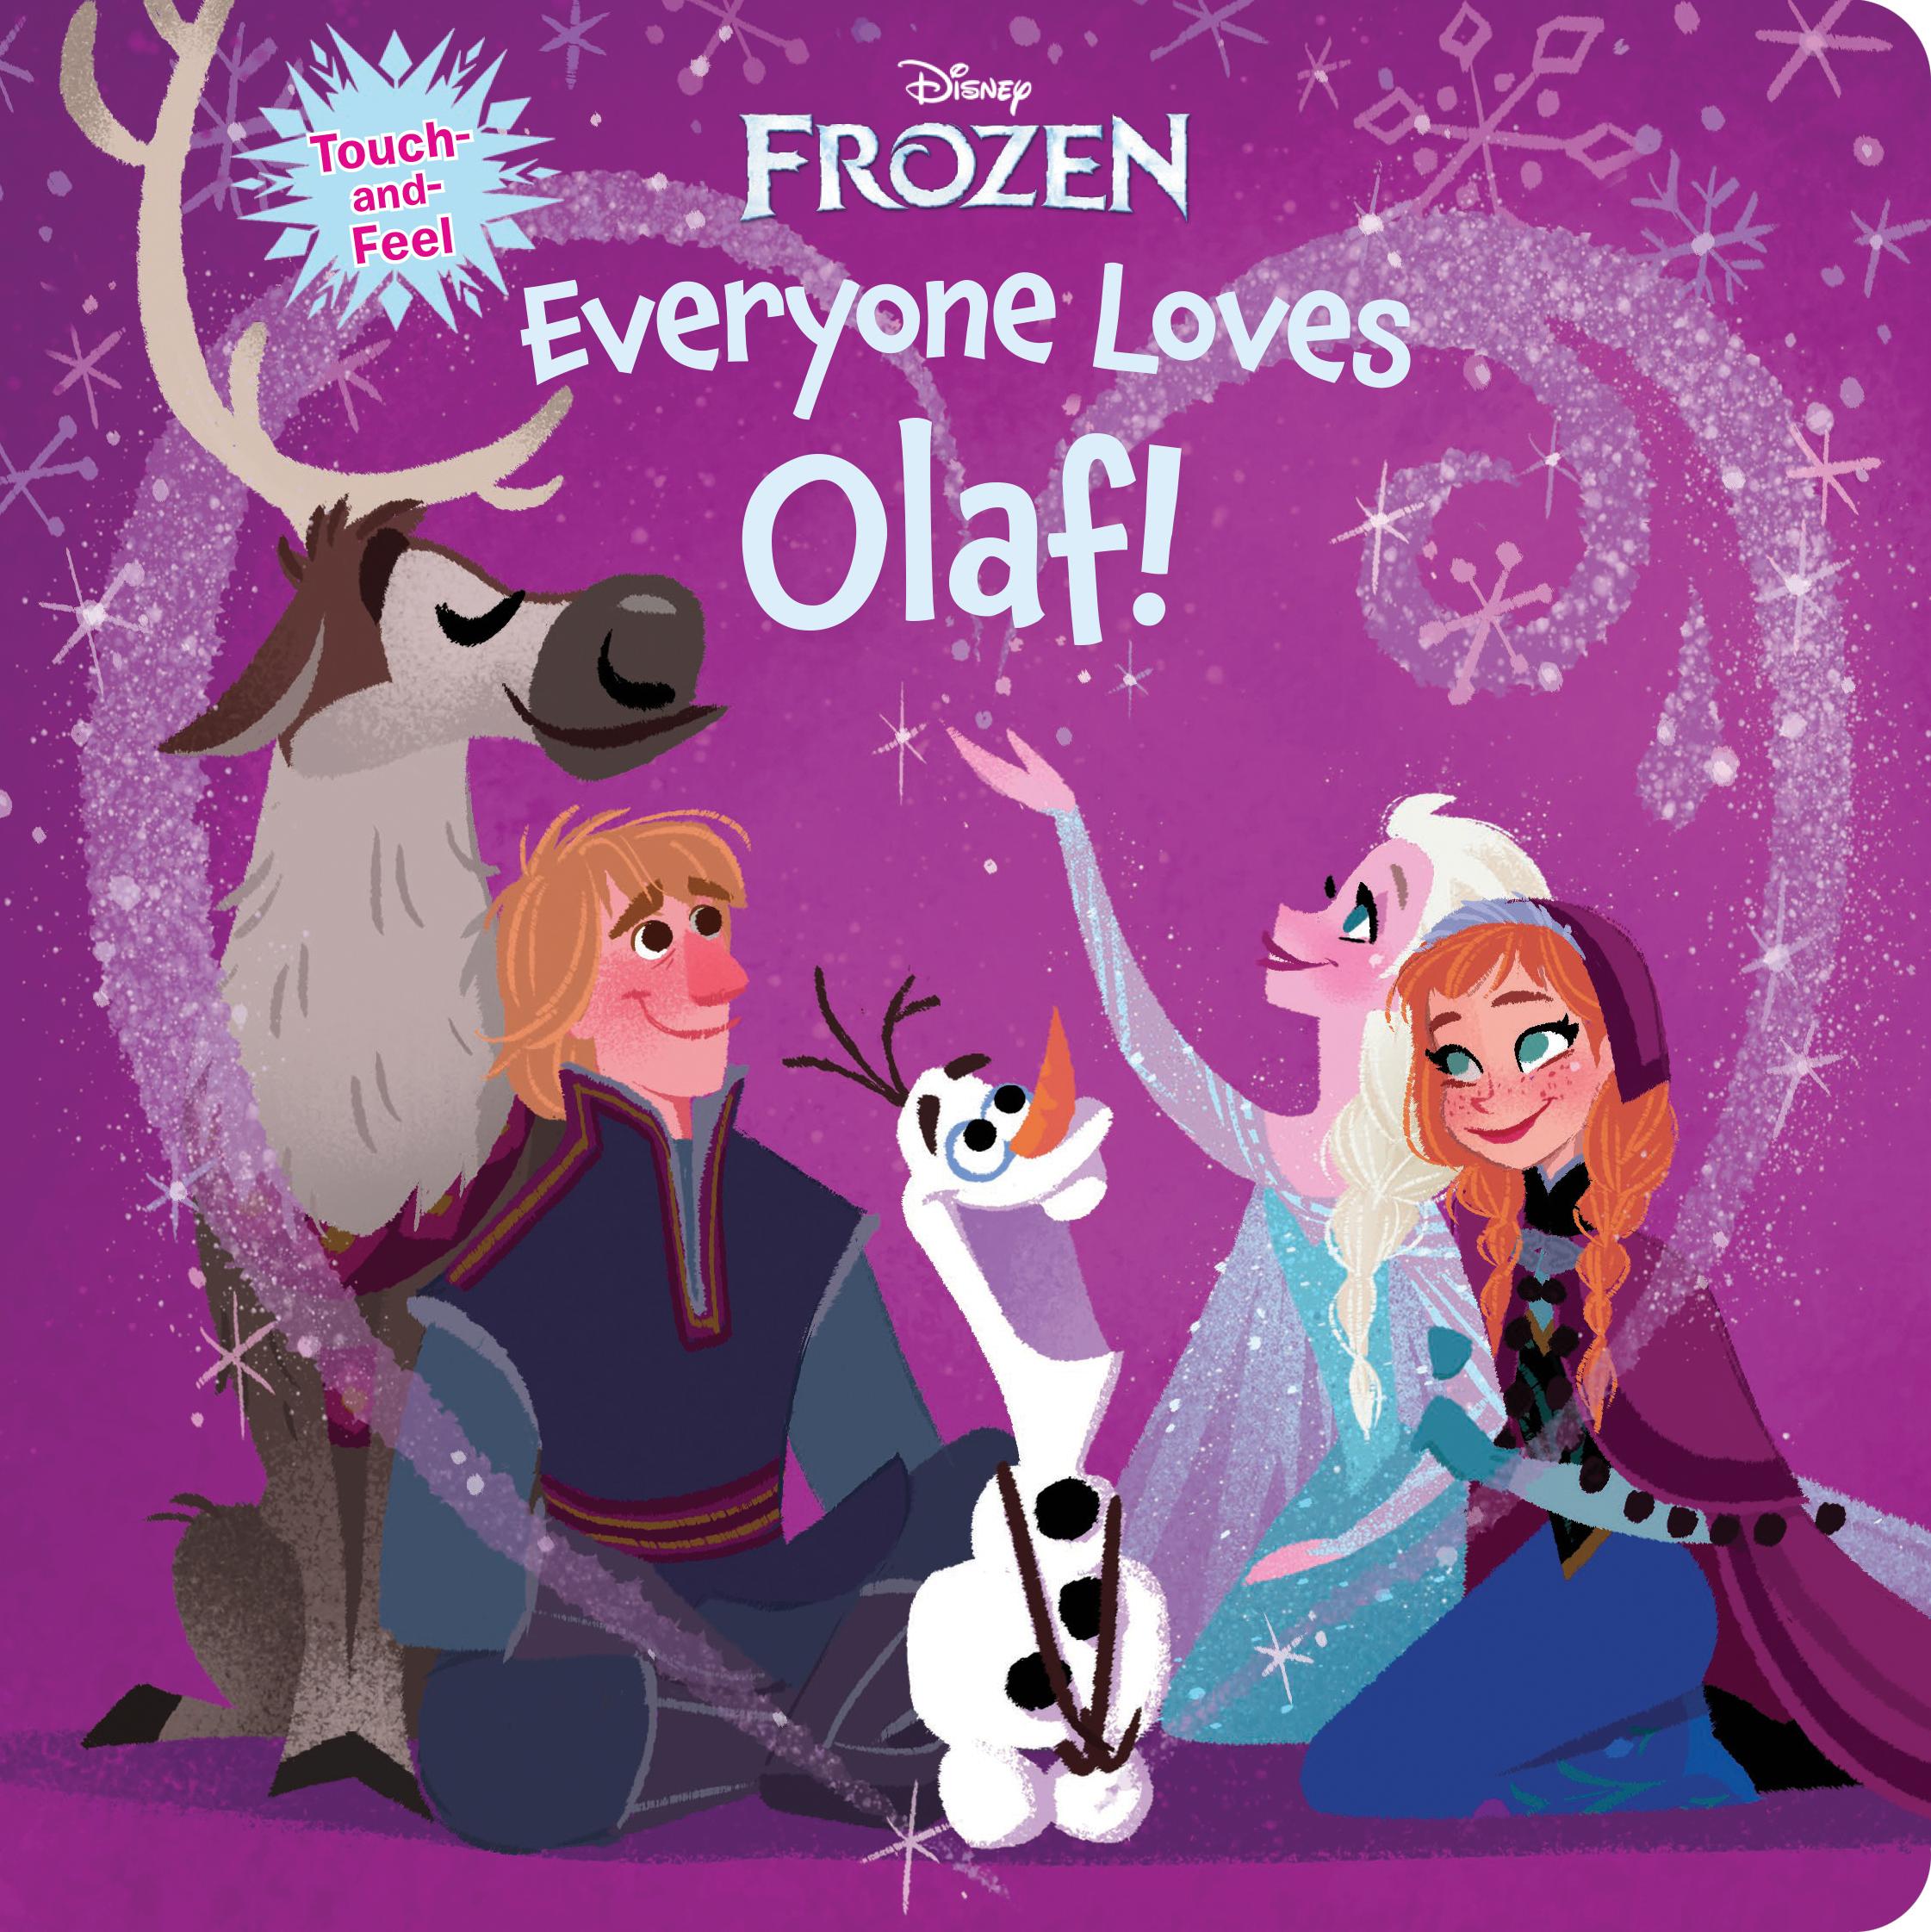 Frozen: Everyone Loves Olaf | Disney Books | Disney Publishing Worldwide